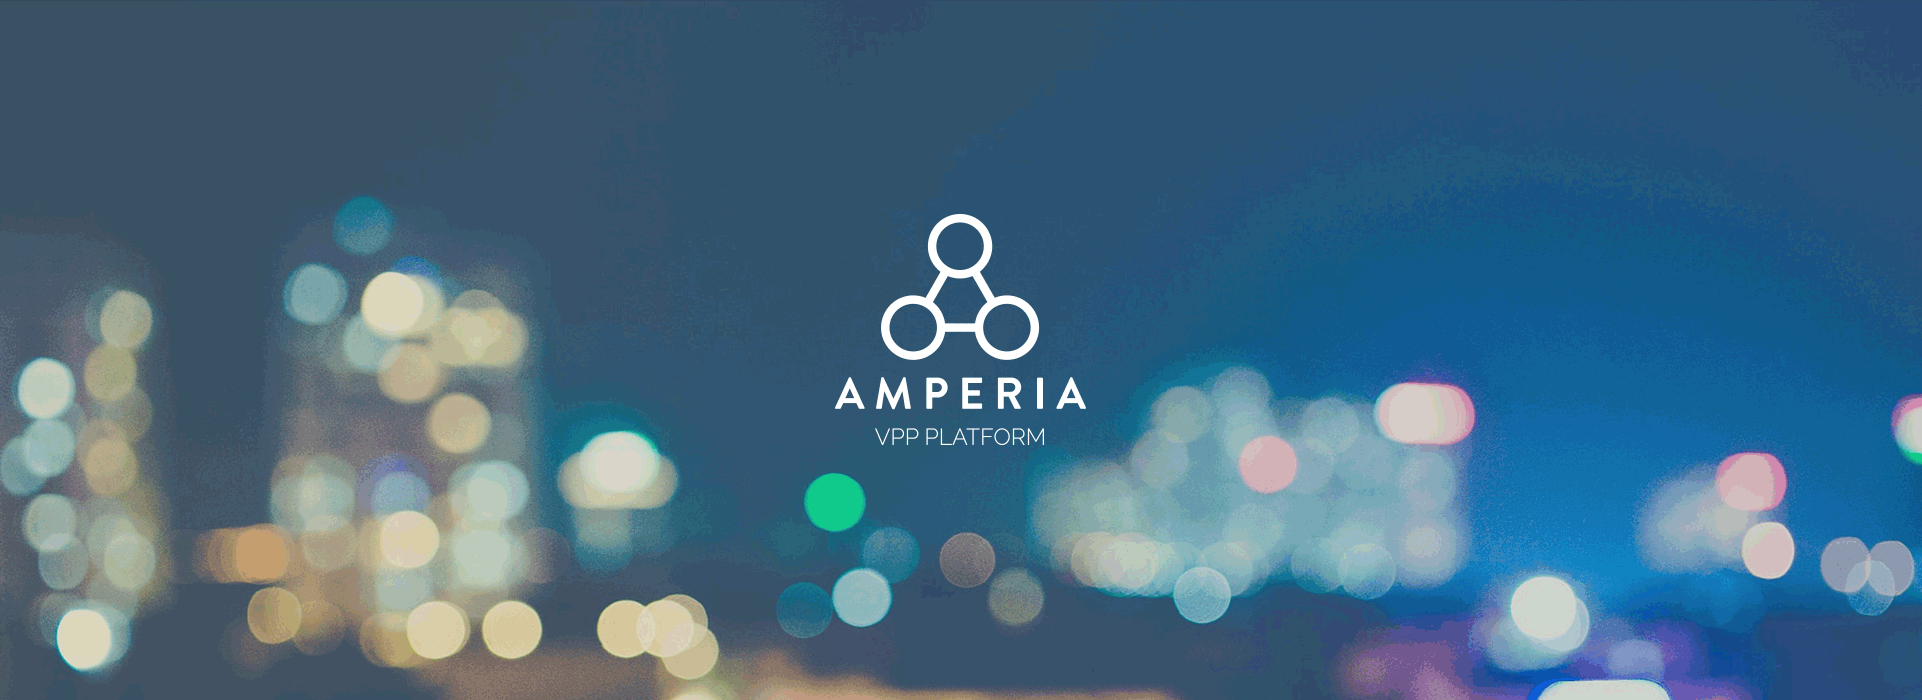 proyecto amperia